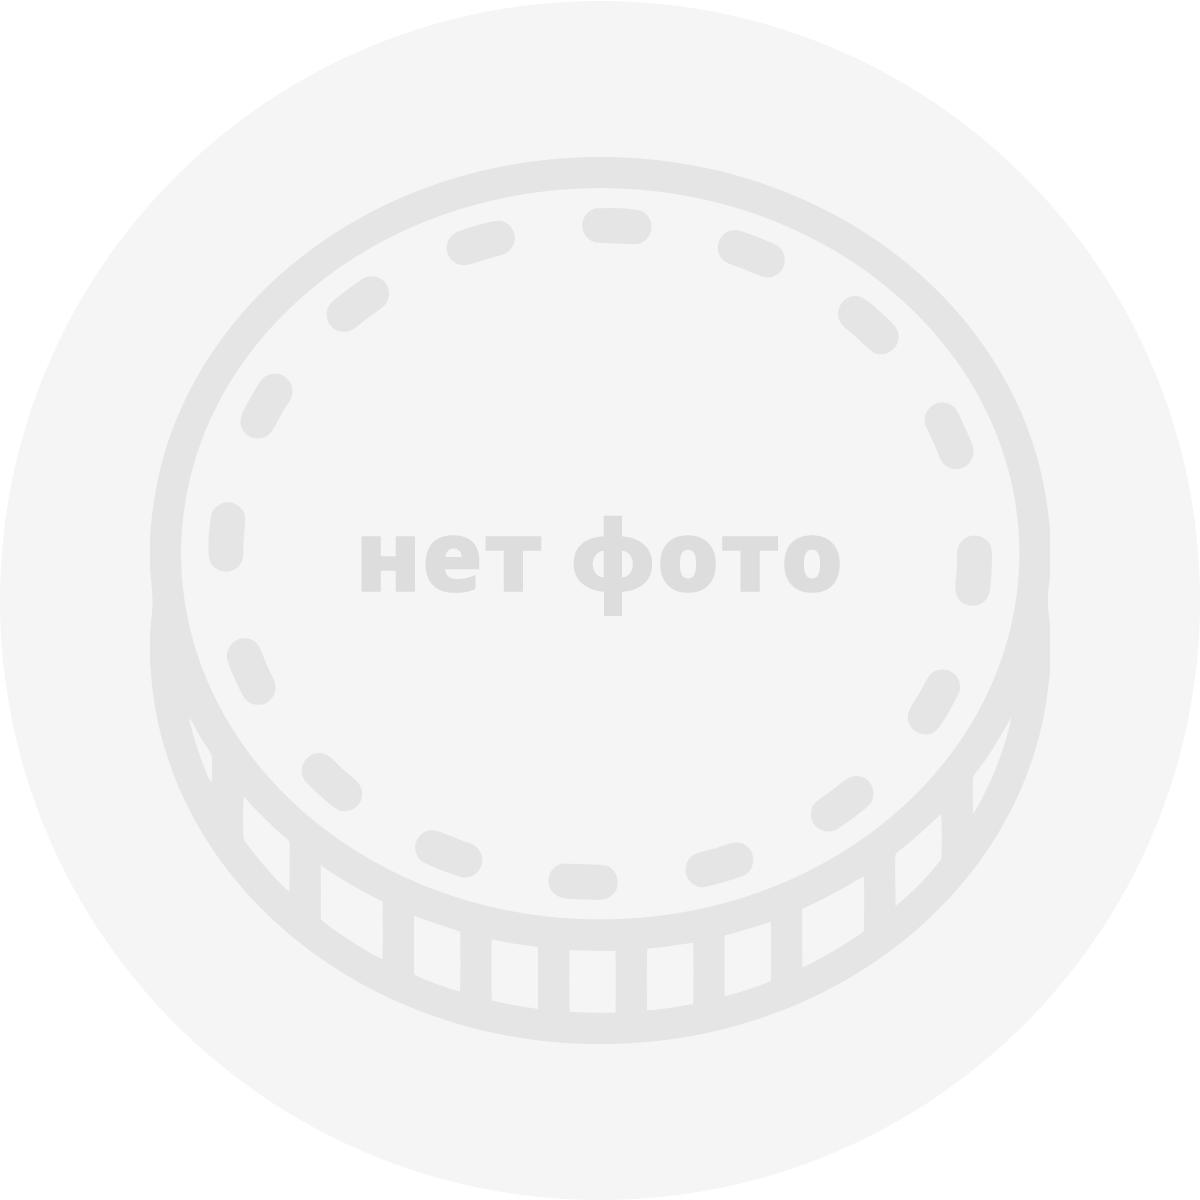 выдающиеся личности армеяний Выдающиеся личности Германии by Olesya Olesya on Prezi